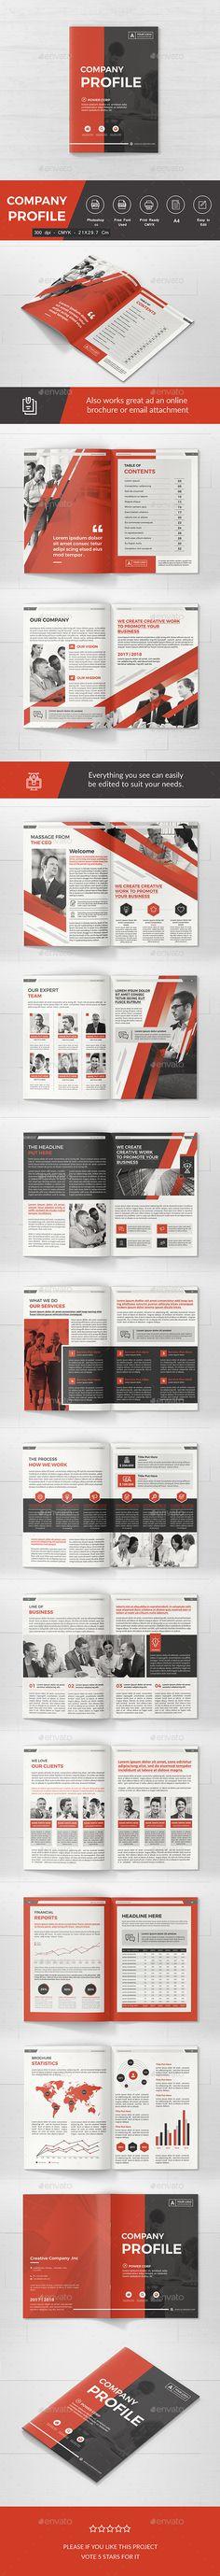 #Company Profile - #Corporate #Brochures Download here: https://graphicriver.net/item/company-profile/19549824?ref=alena994